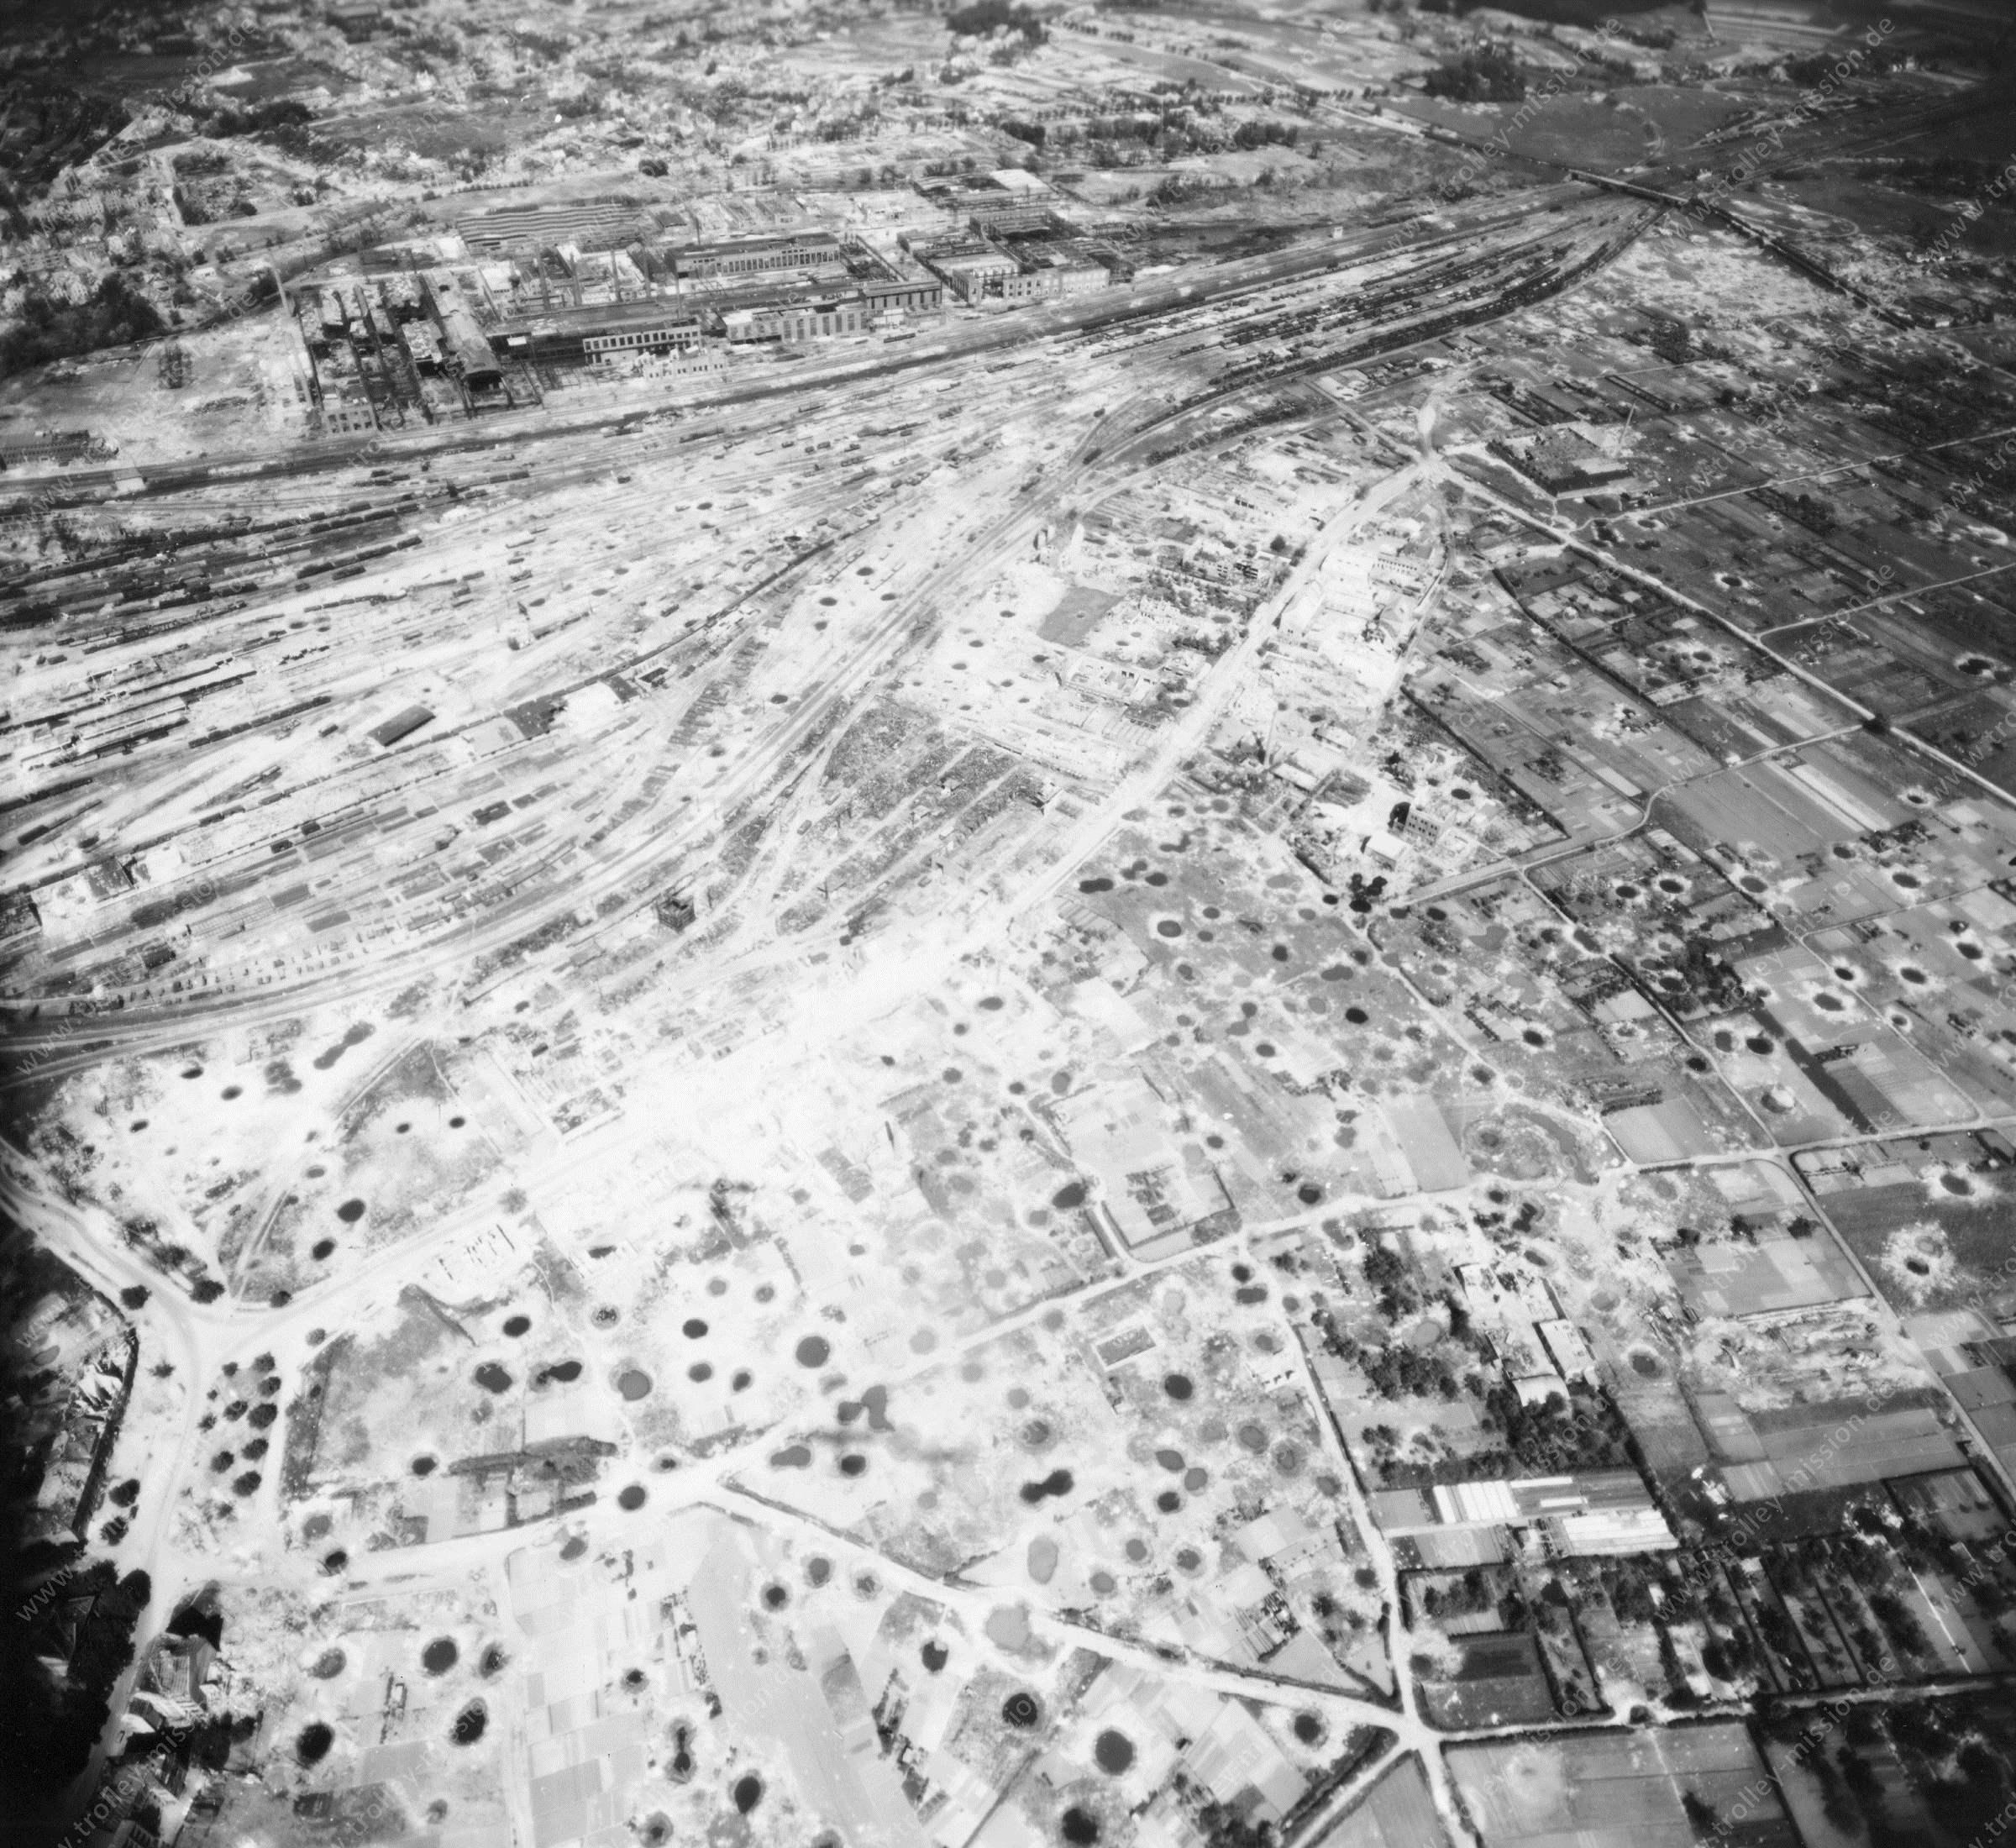 Klöckner-Werke AG Georgsmarienhütte in Osnabrück im Mai 1945 - Luftbild der US Air Force